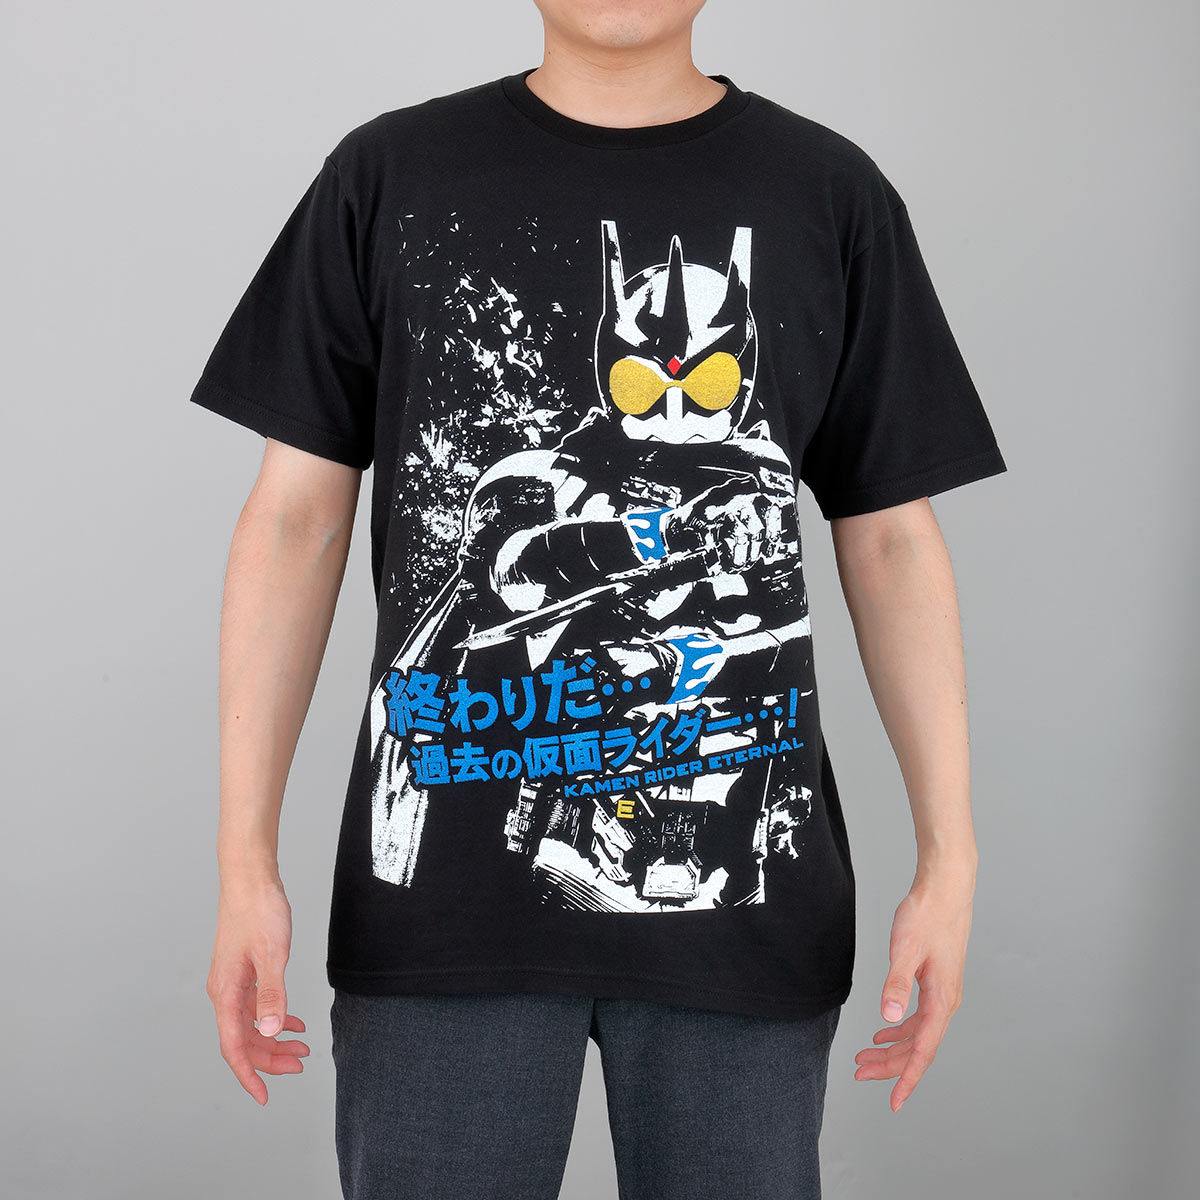 Kamen Rider W Climax Scene T-shirt - Kamen Rider Eternal ver.